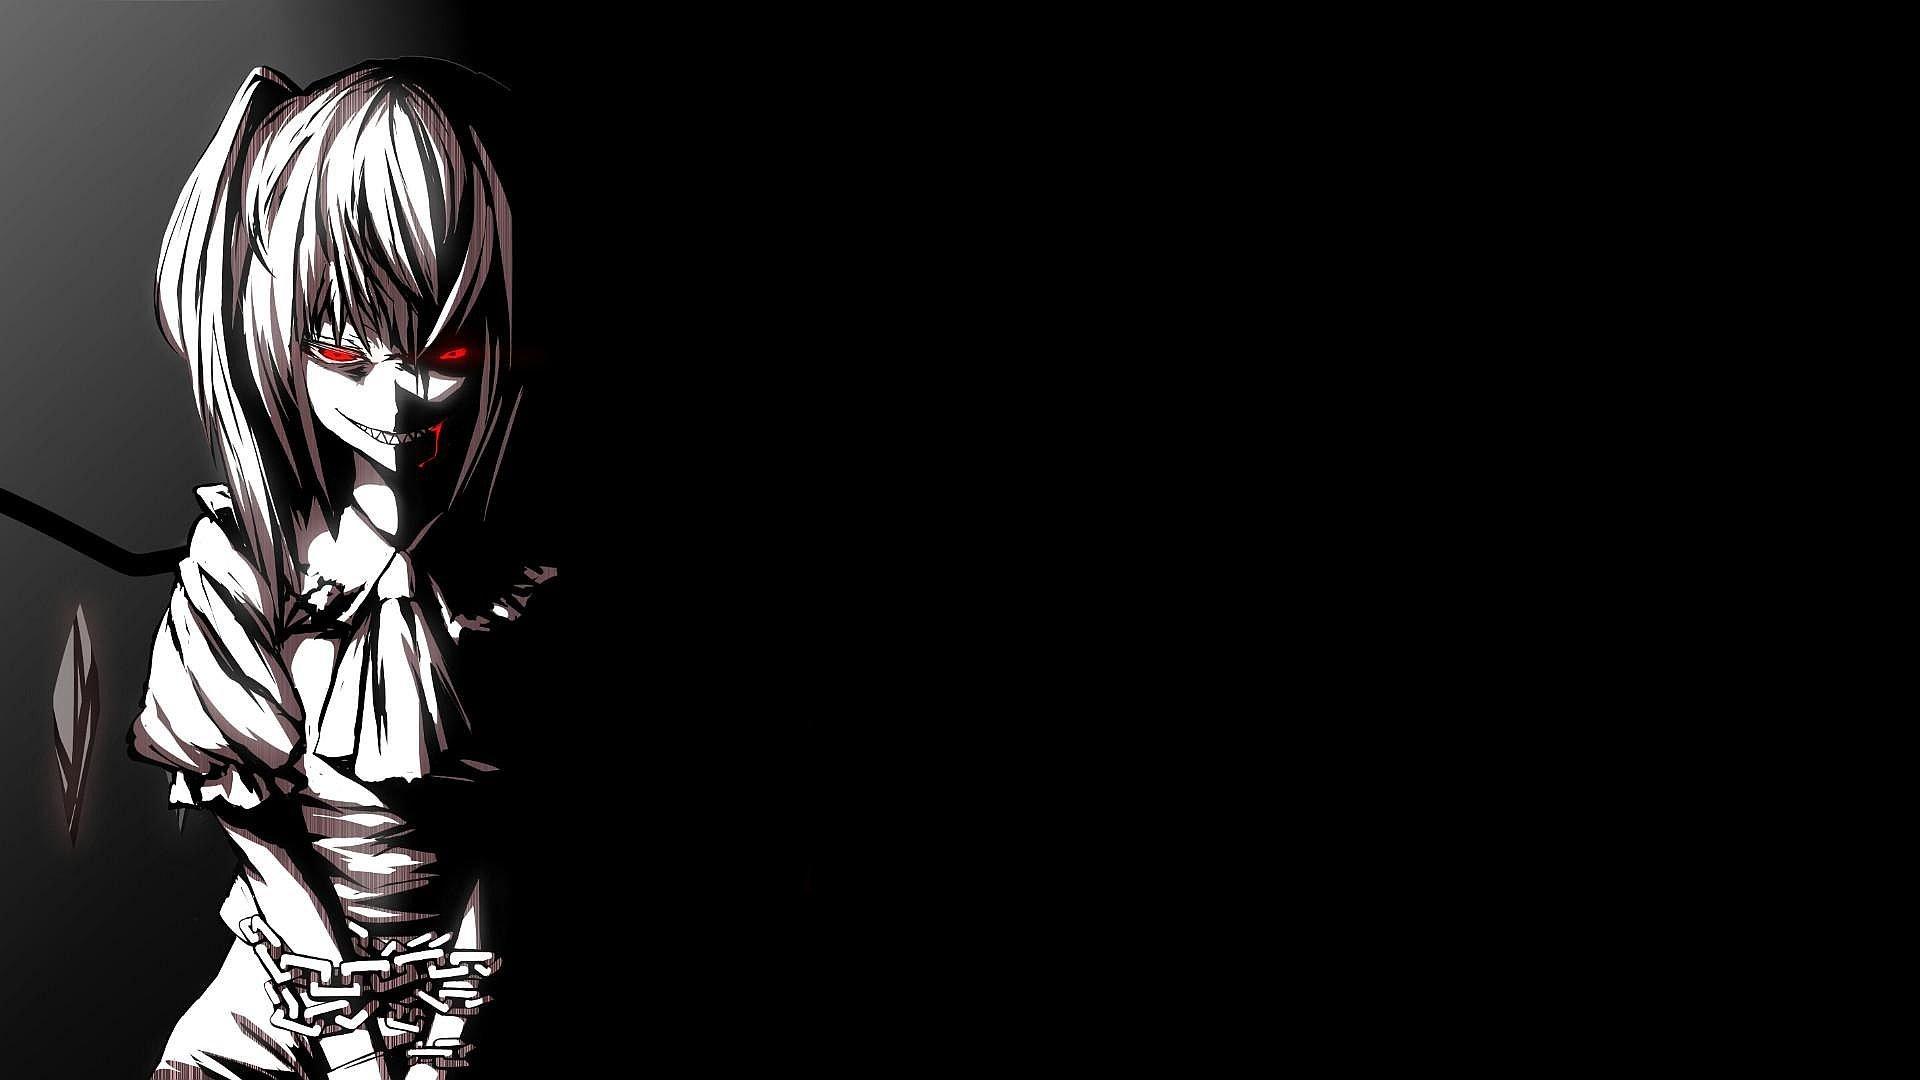 46 Dark Anime Wallpaper Hd On Wallpapersafari